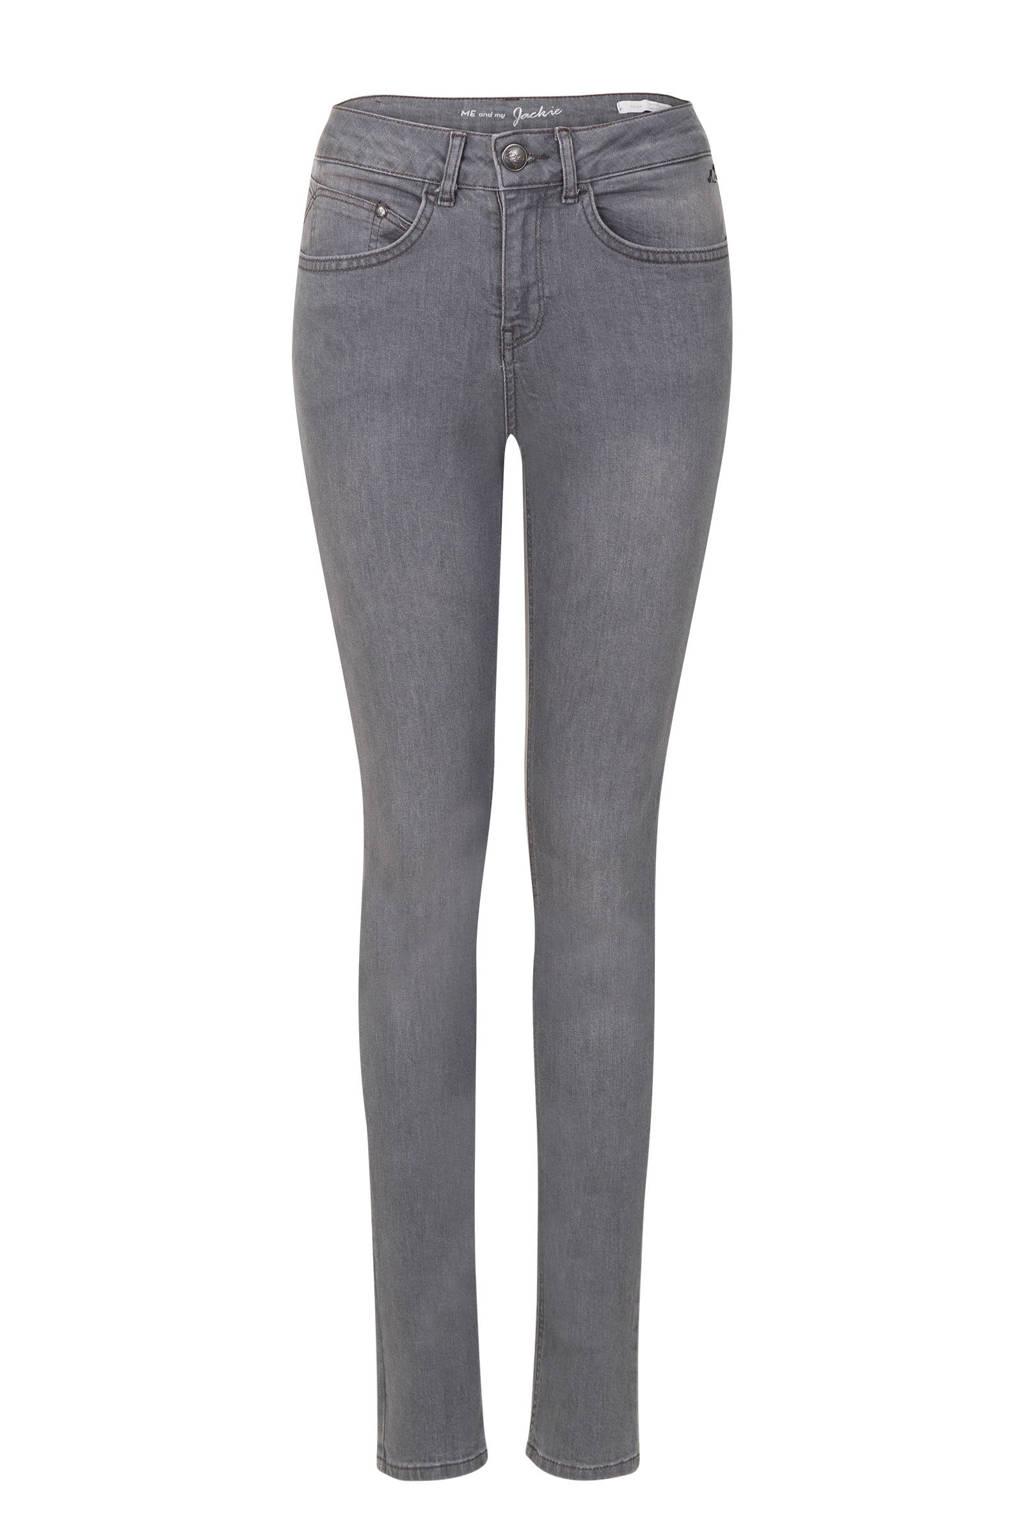 Miss Etam Regulier straight fit jeans grijs, Grijs